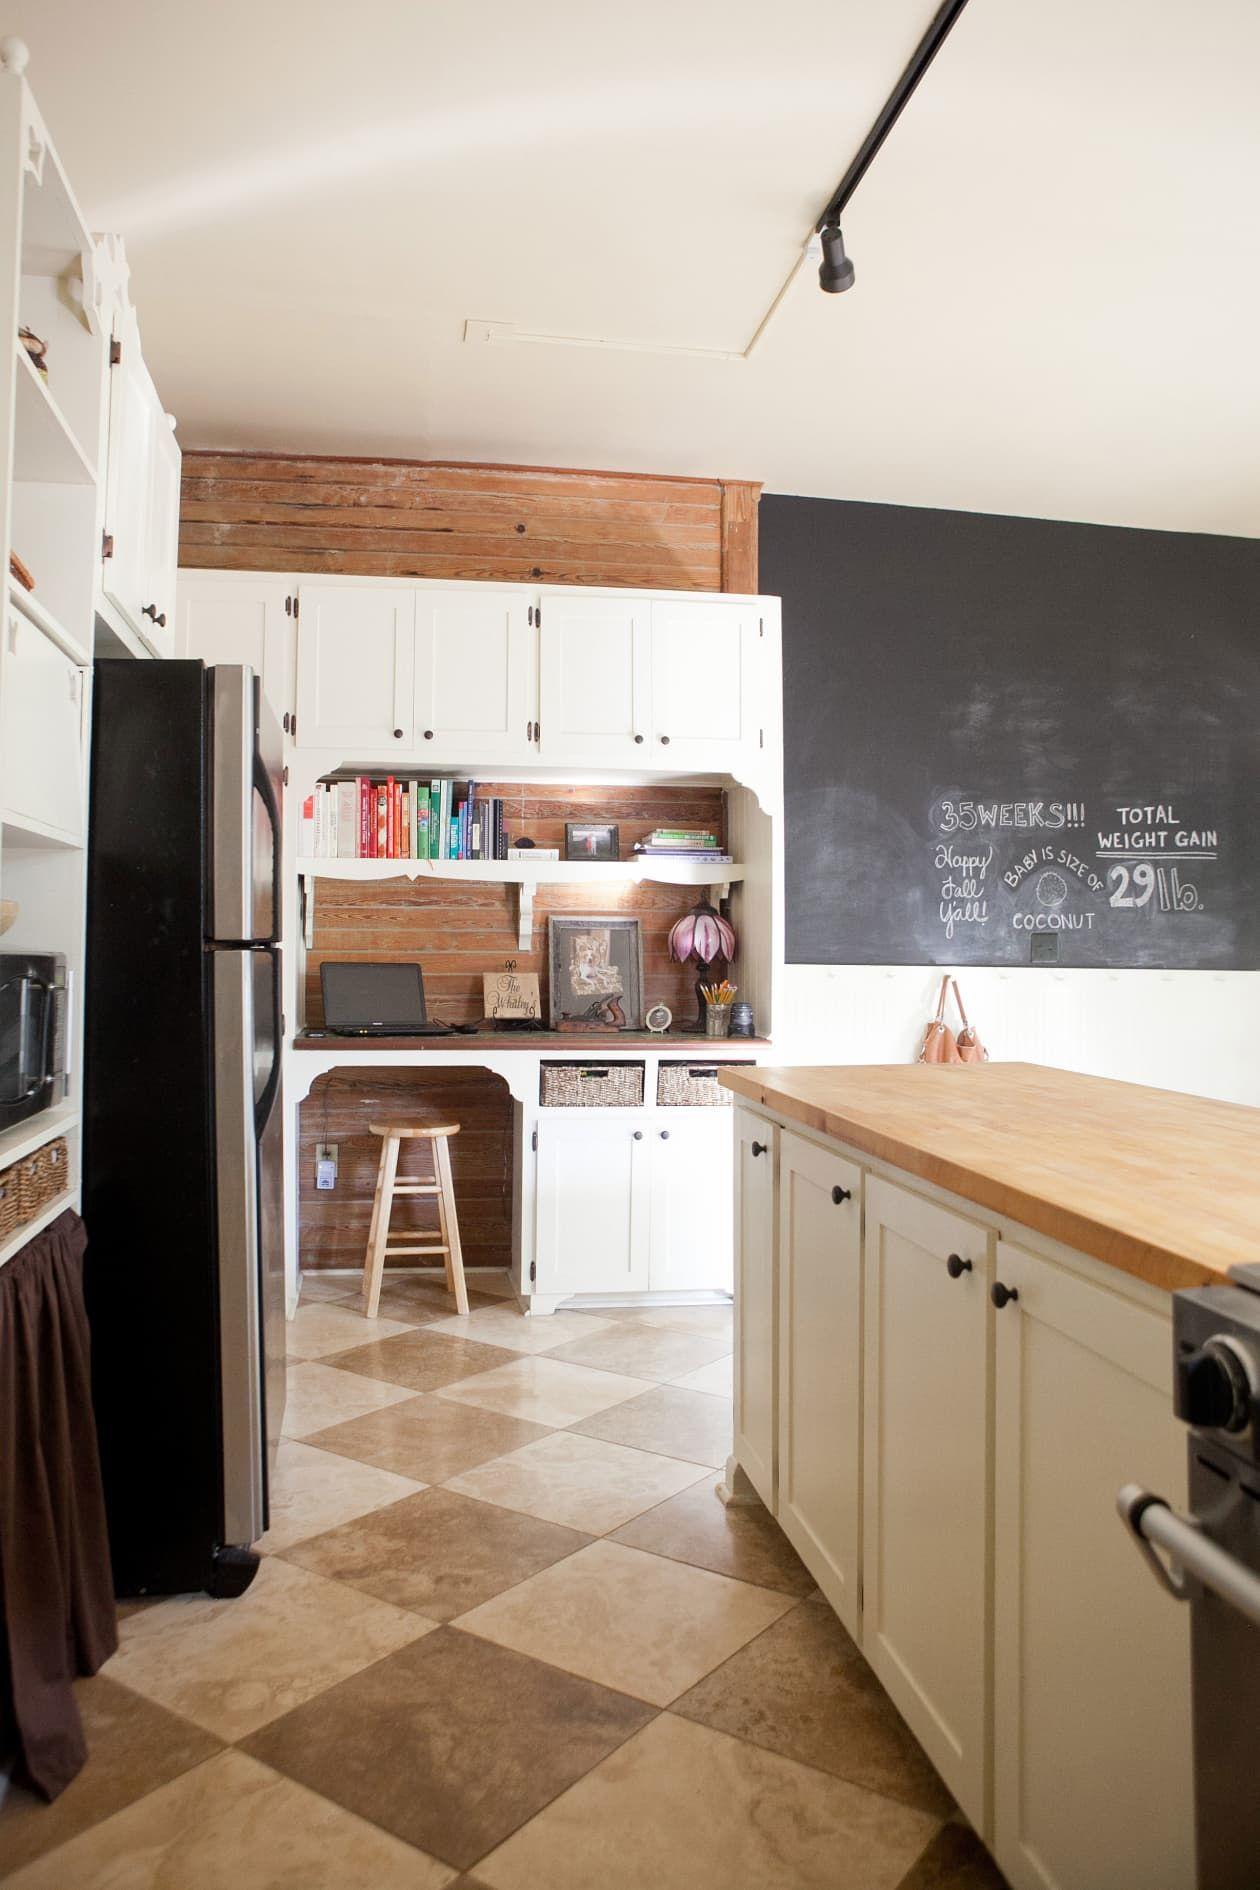 Alicia Adam S Southern Victorian Kitchen In 2020 Best Kitchen Cabinets Victorian Kitchen Kitchen Cabinets